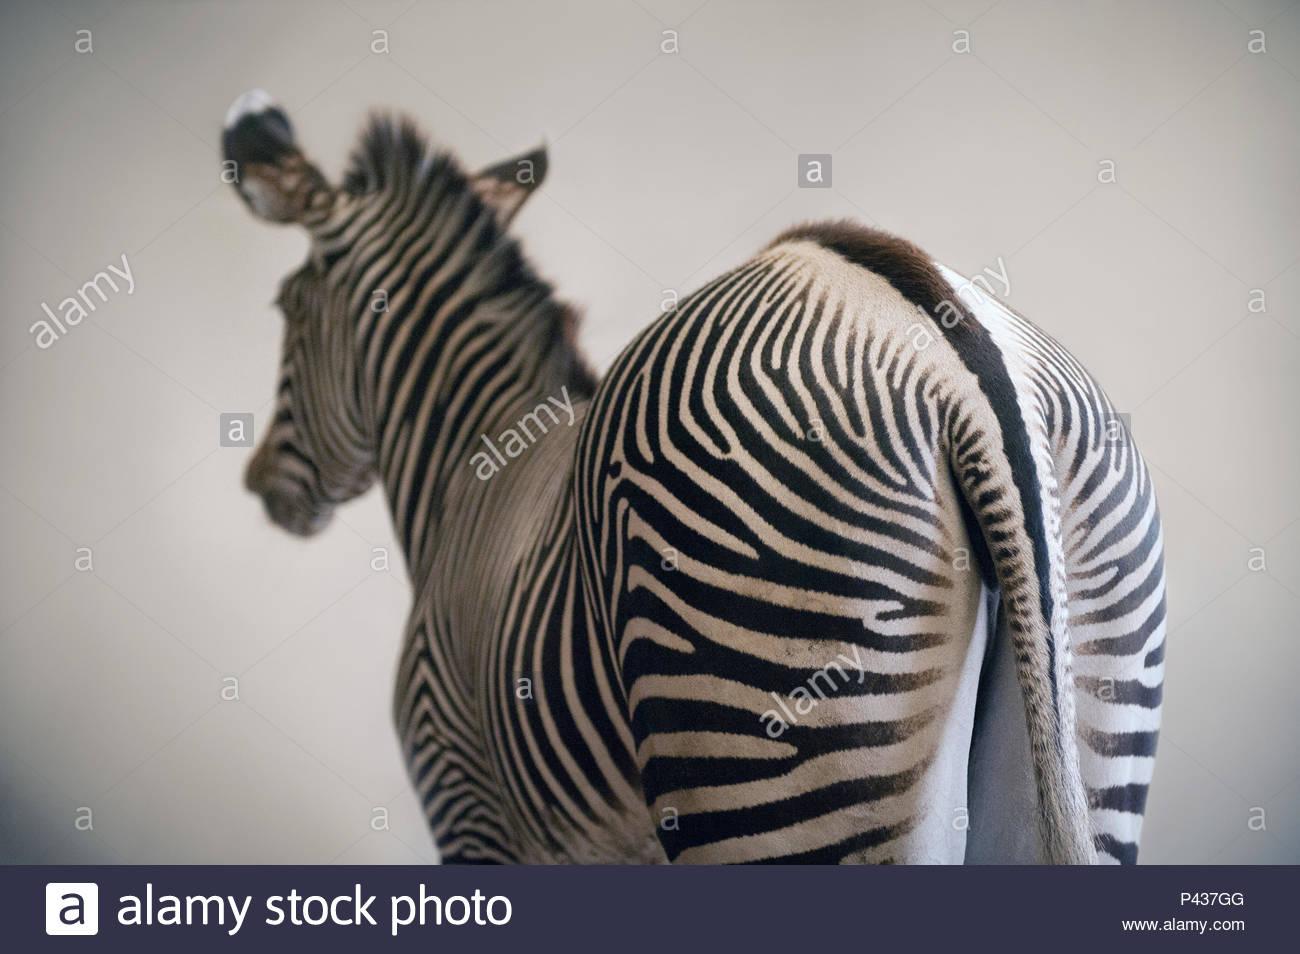 Grevy's zebra, Equus grevyi, at the Lee G. Simmons Conservation Park and Wildlife Safari near Ashland, Nebraska. - Stock Image